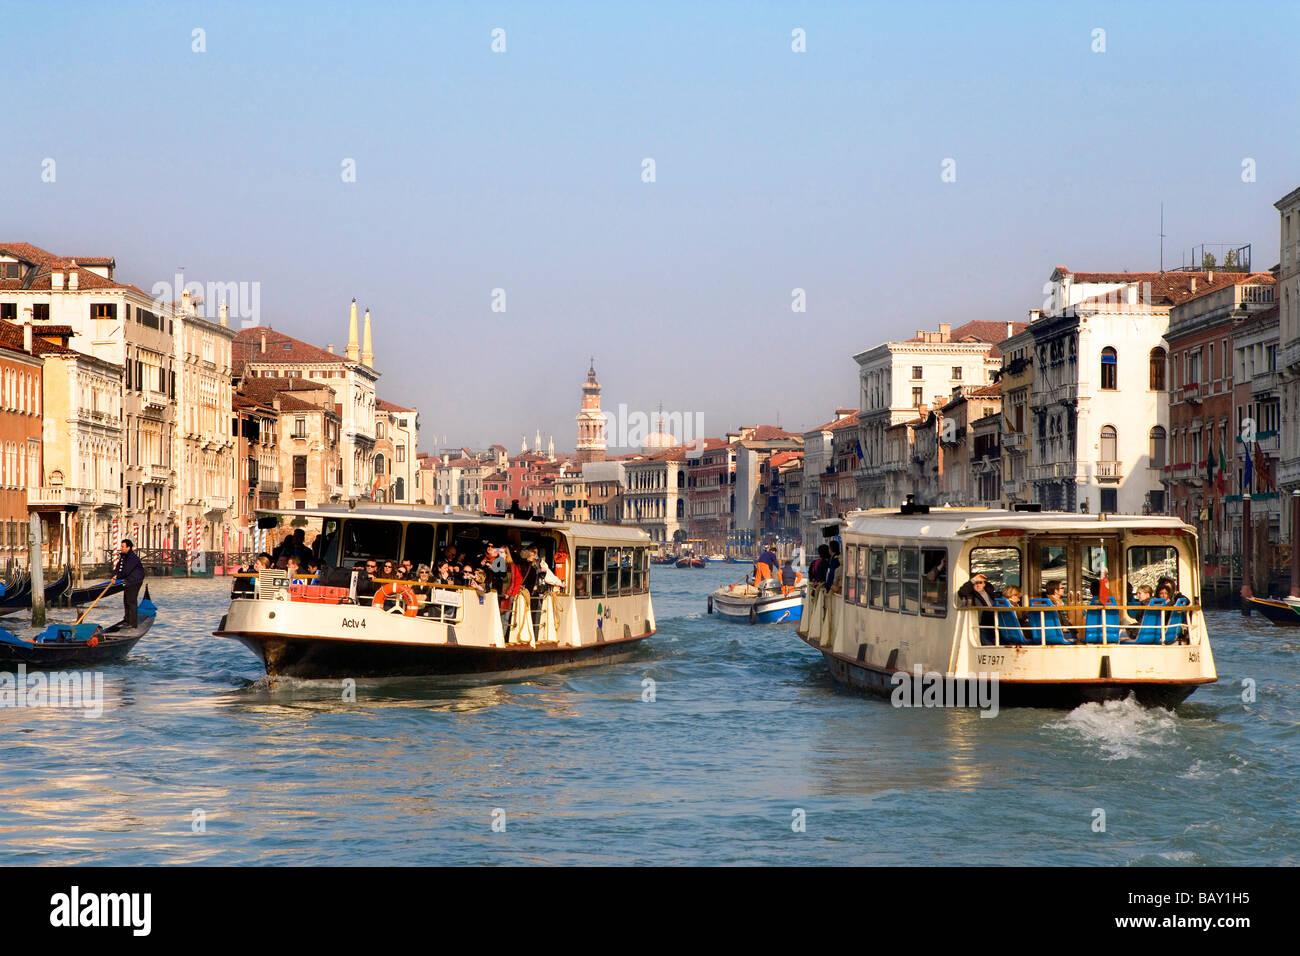 Grand Canal with Vaporetto, motorized waterbus, Venice, Veneto, Italy - Stock Image